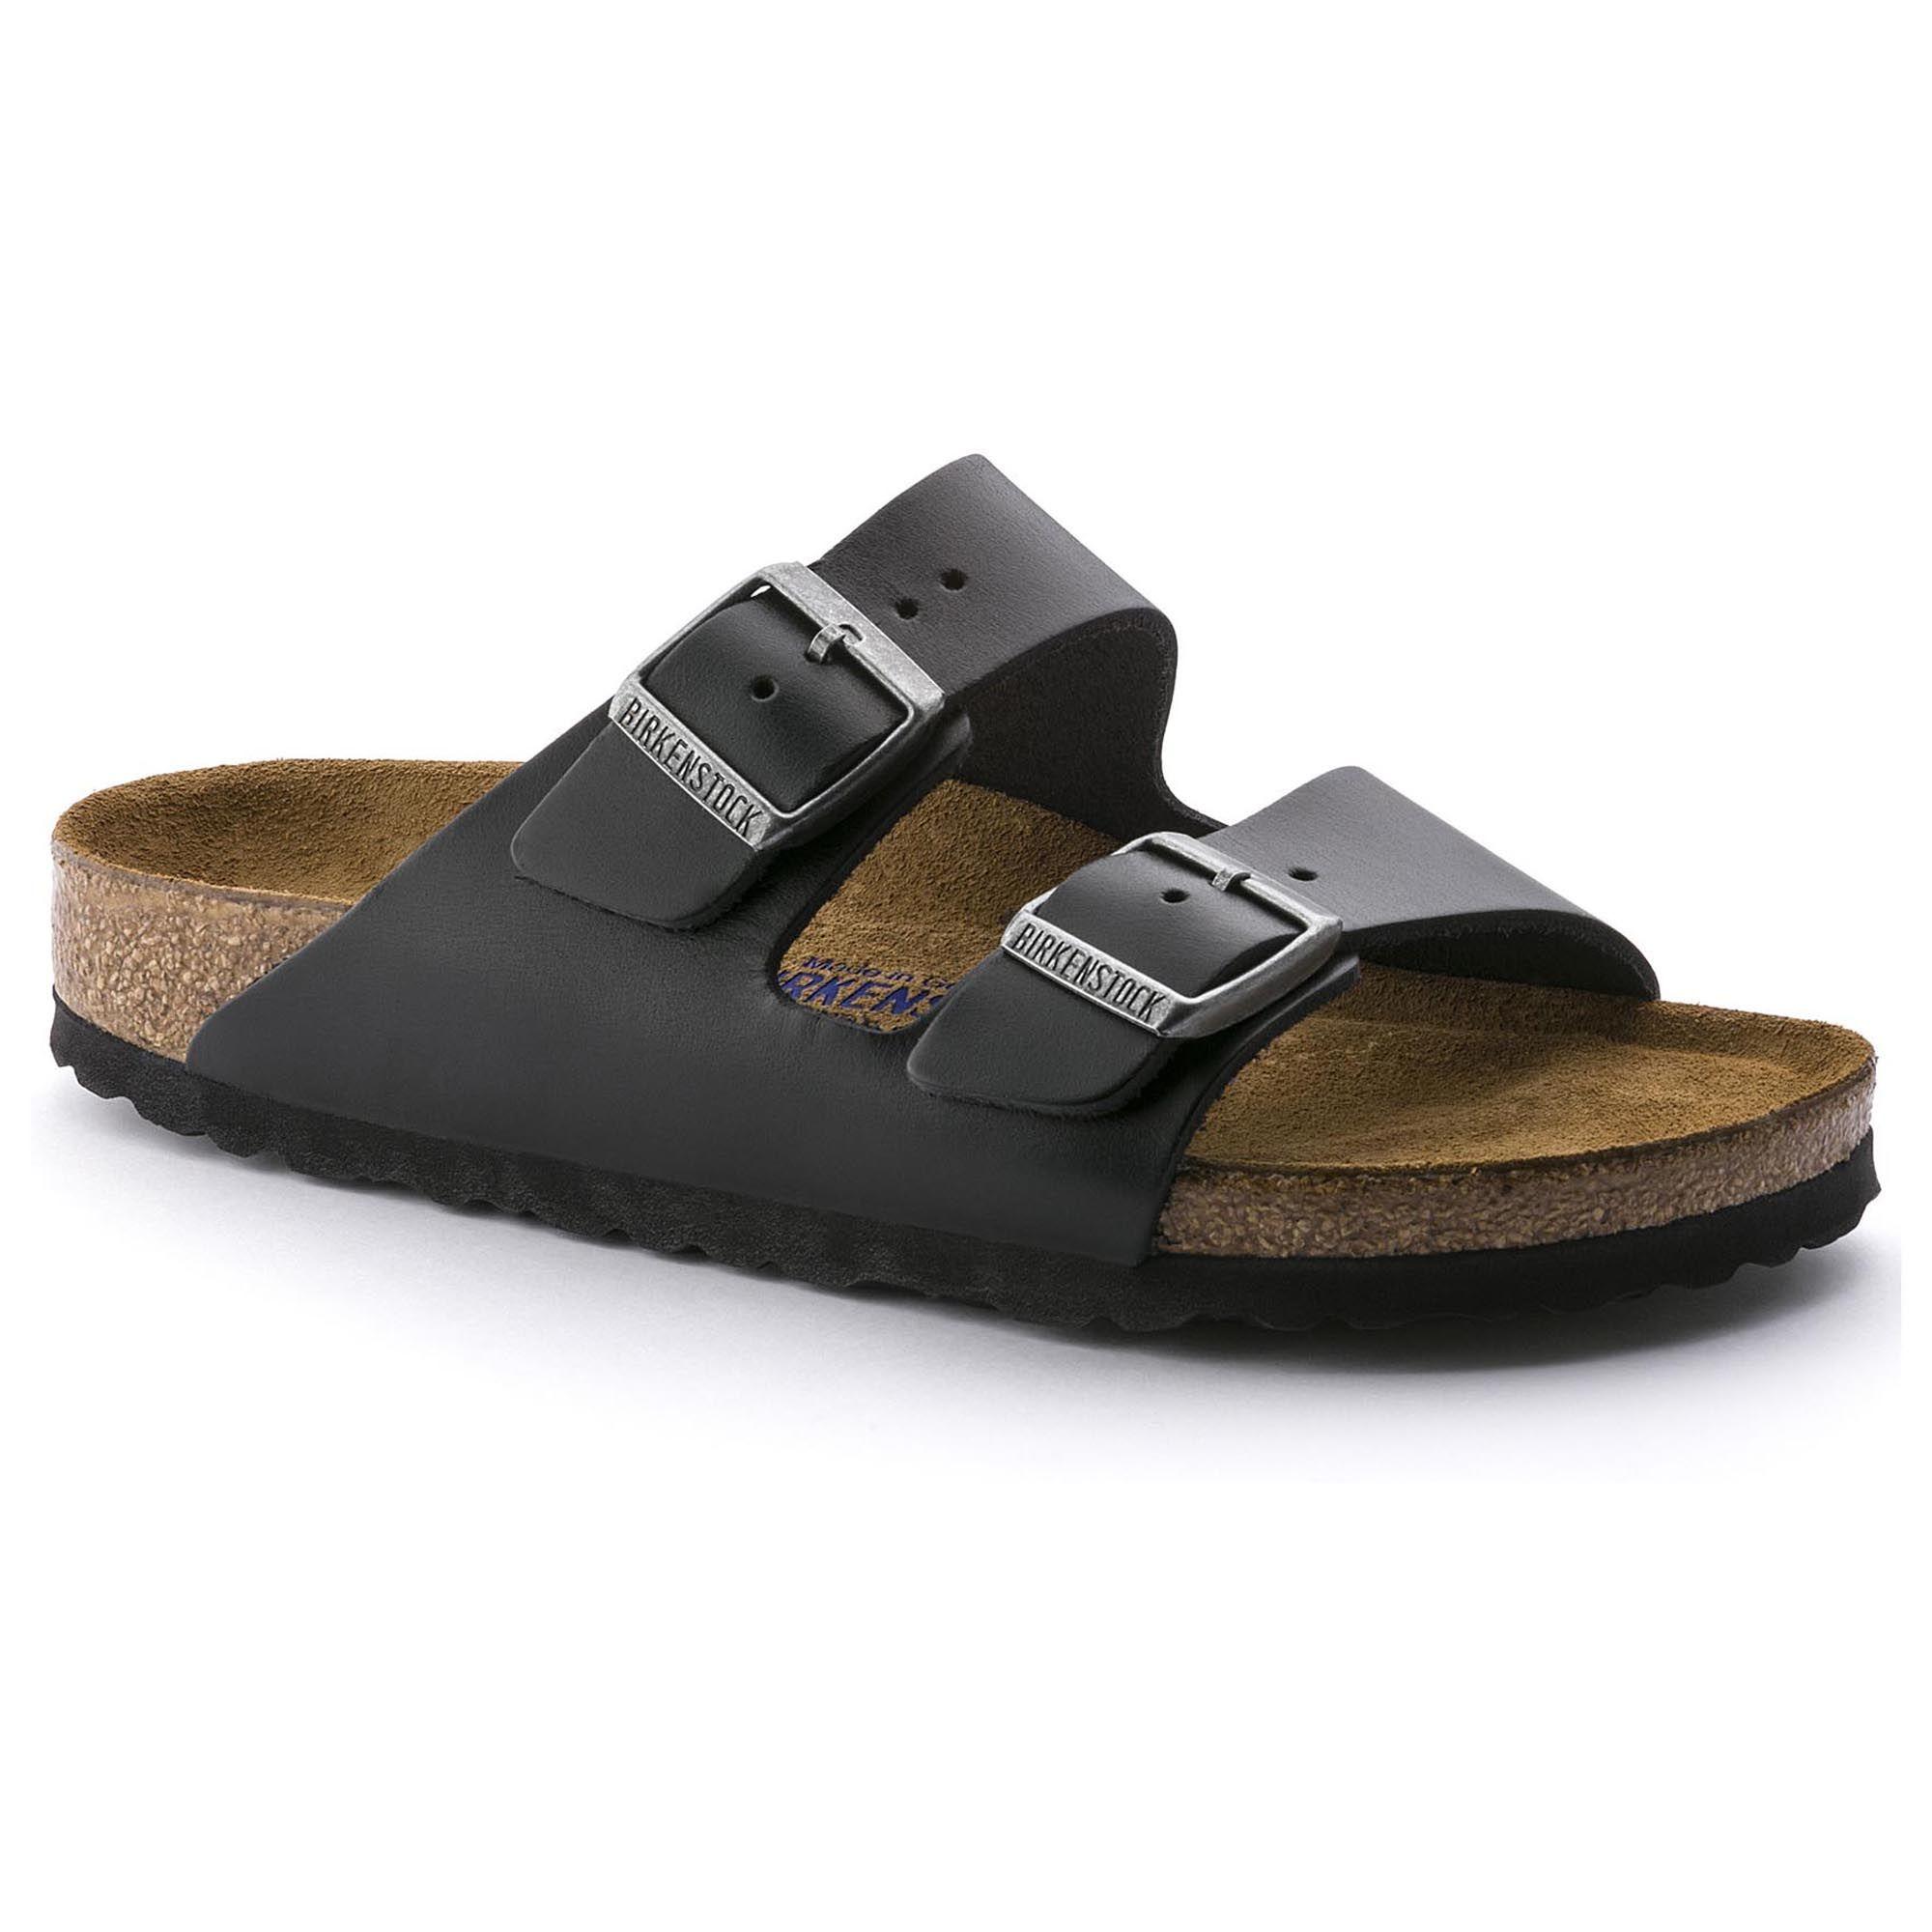 Birkenstock Arizona Soft Footbed Black Amalfi Leather Sandals